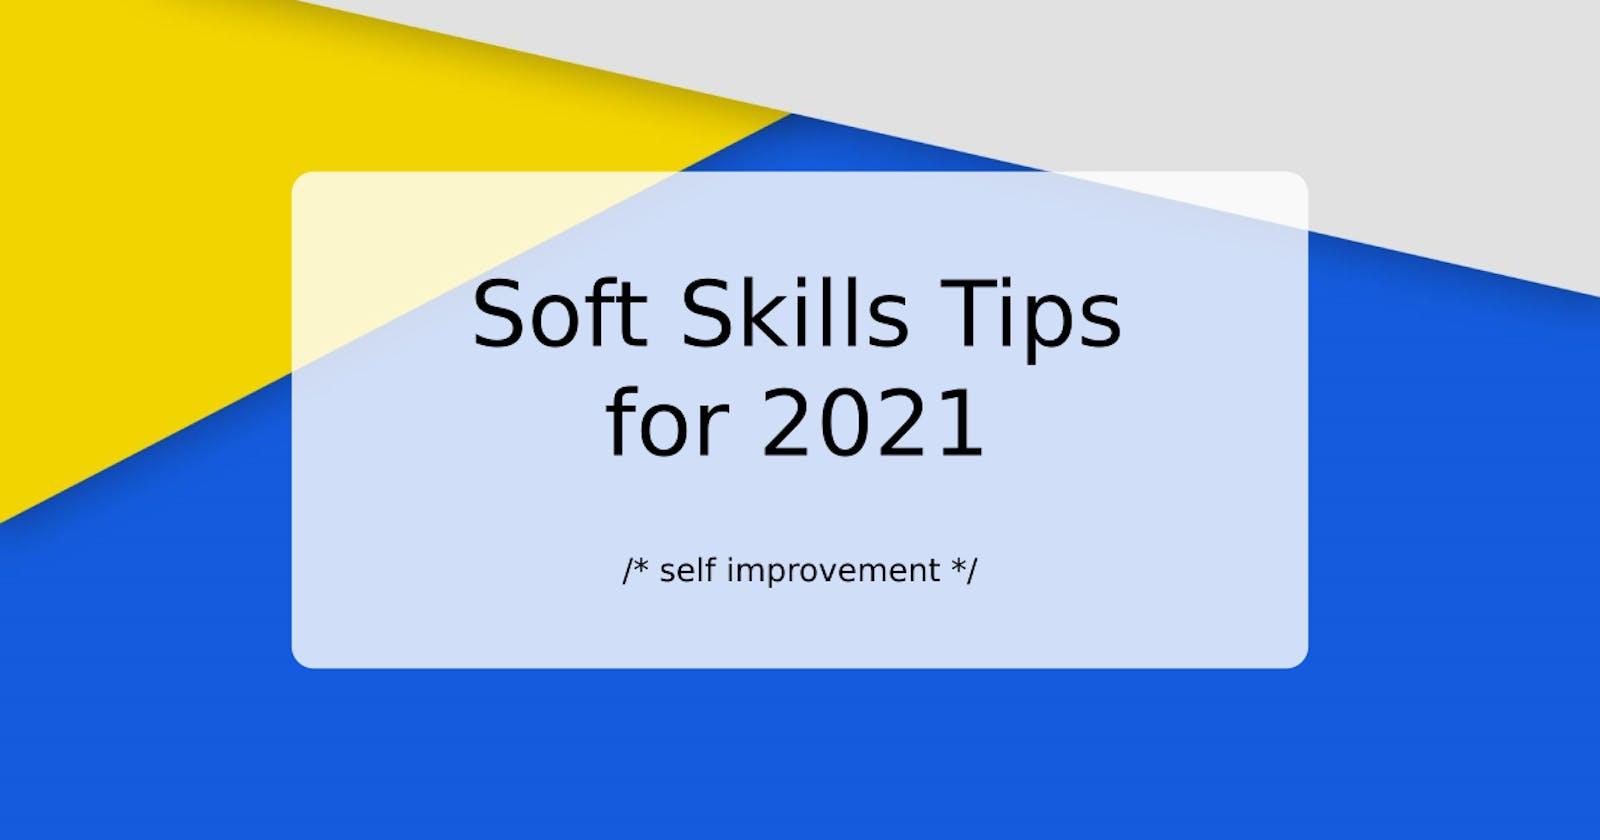 Soft Skills Tips for 2021